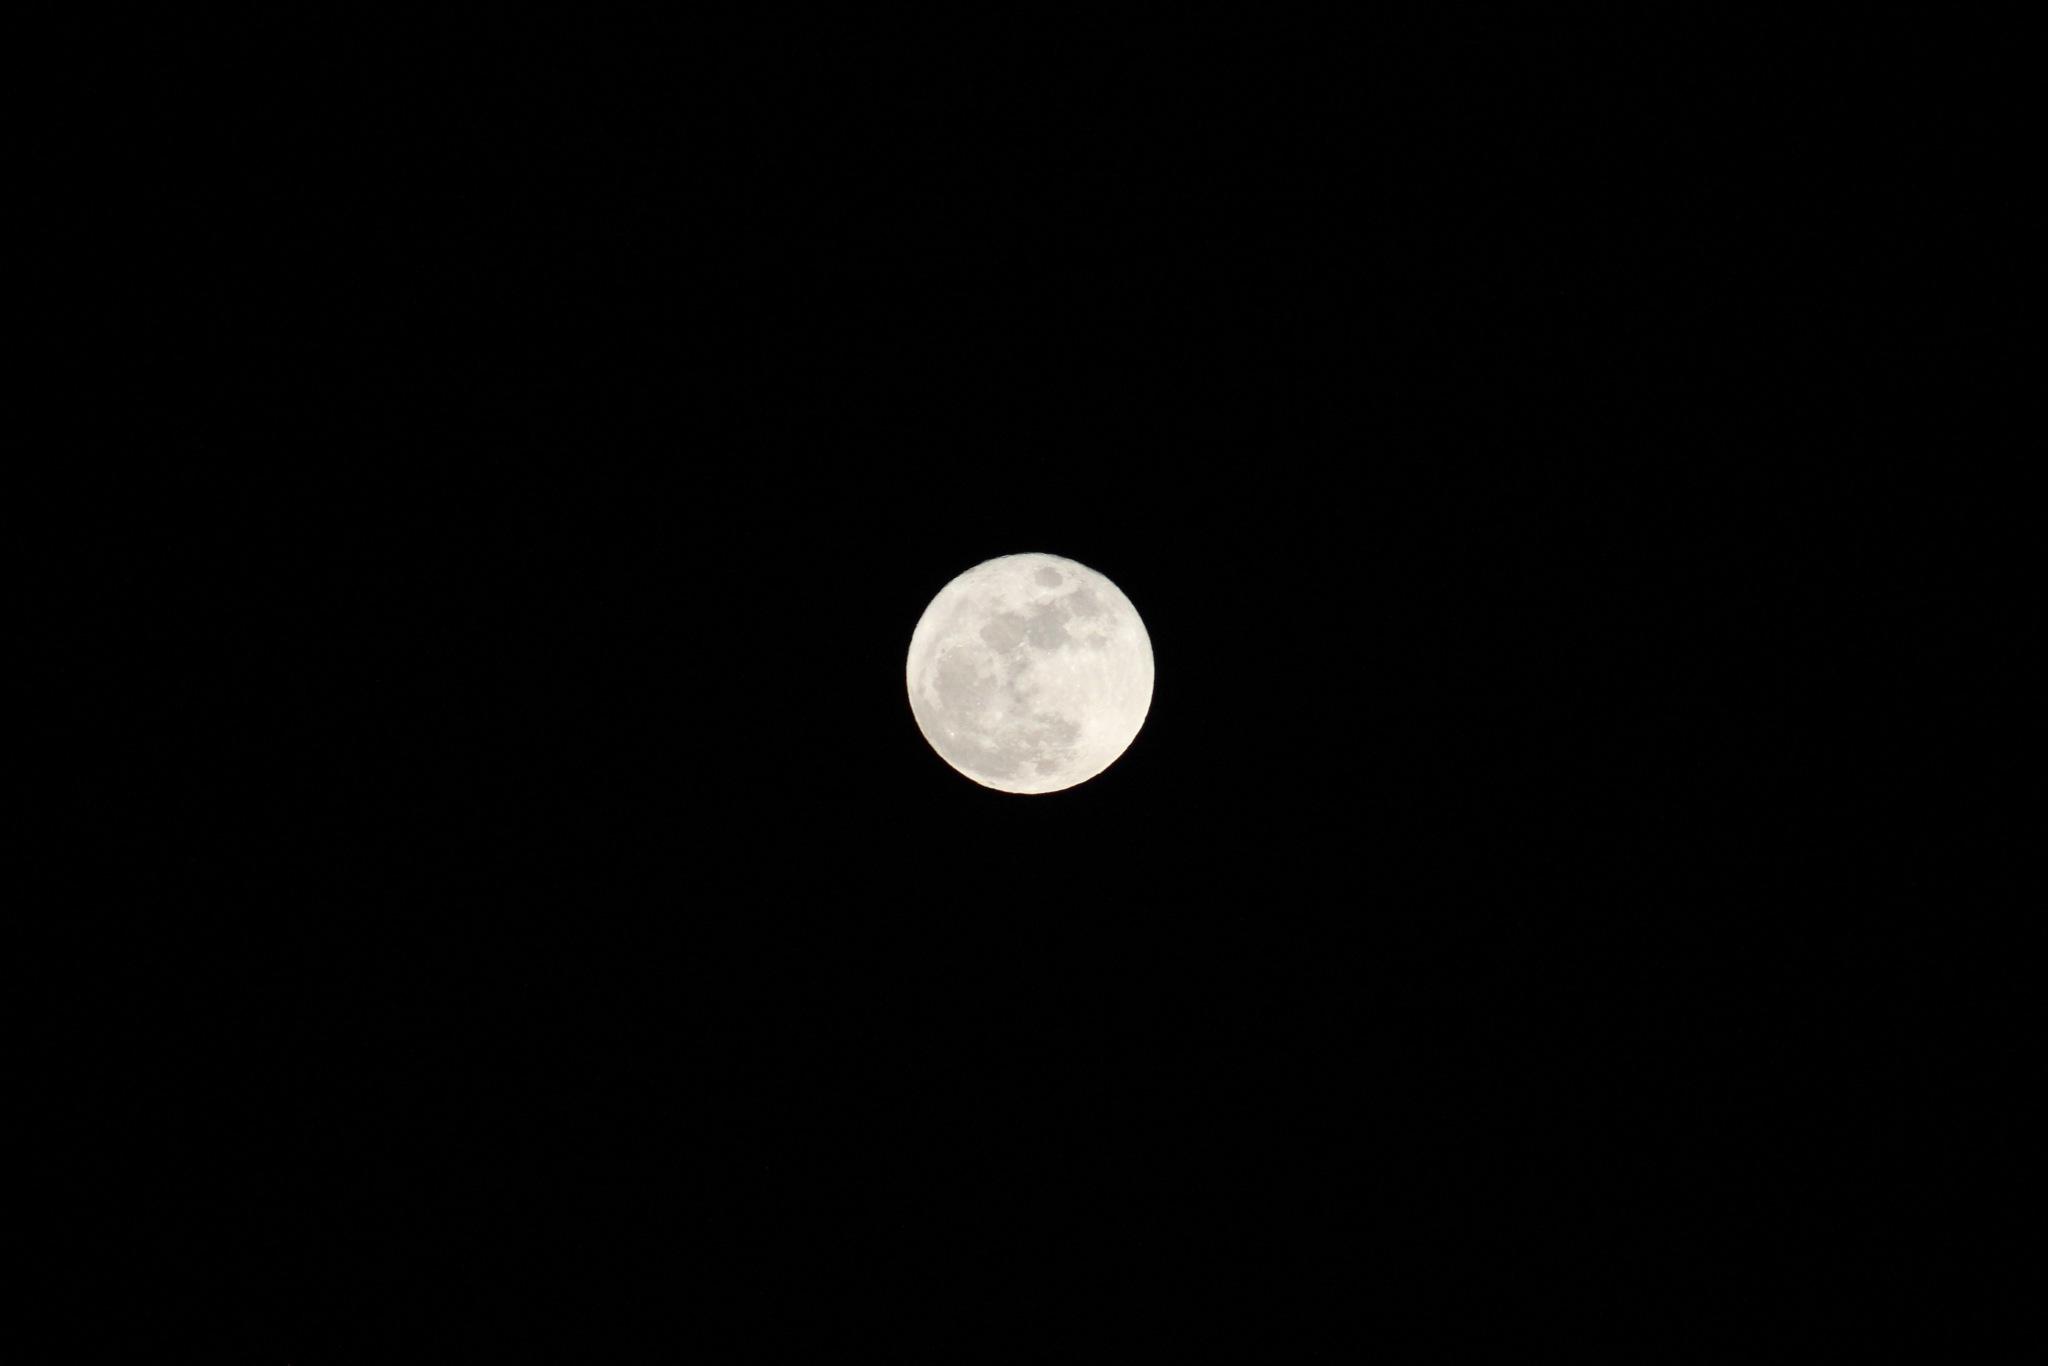 Full moon by Anna Jasmin